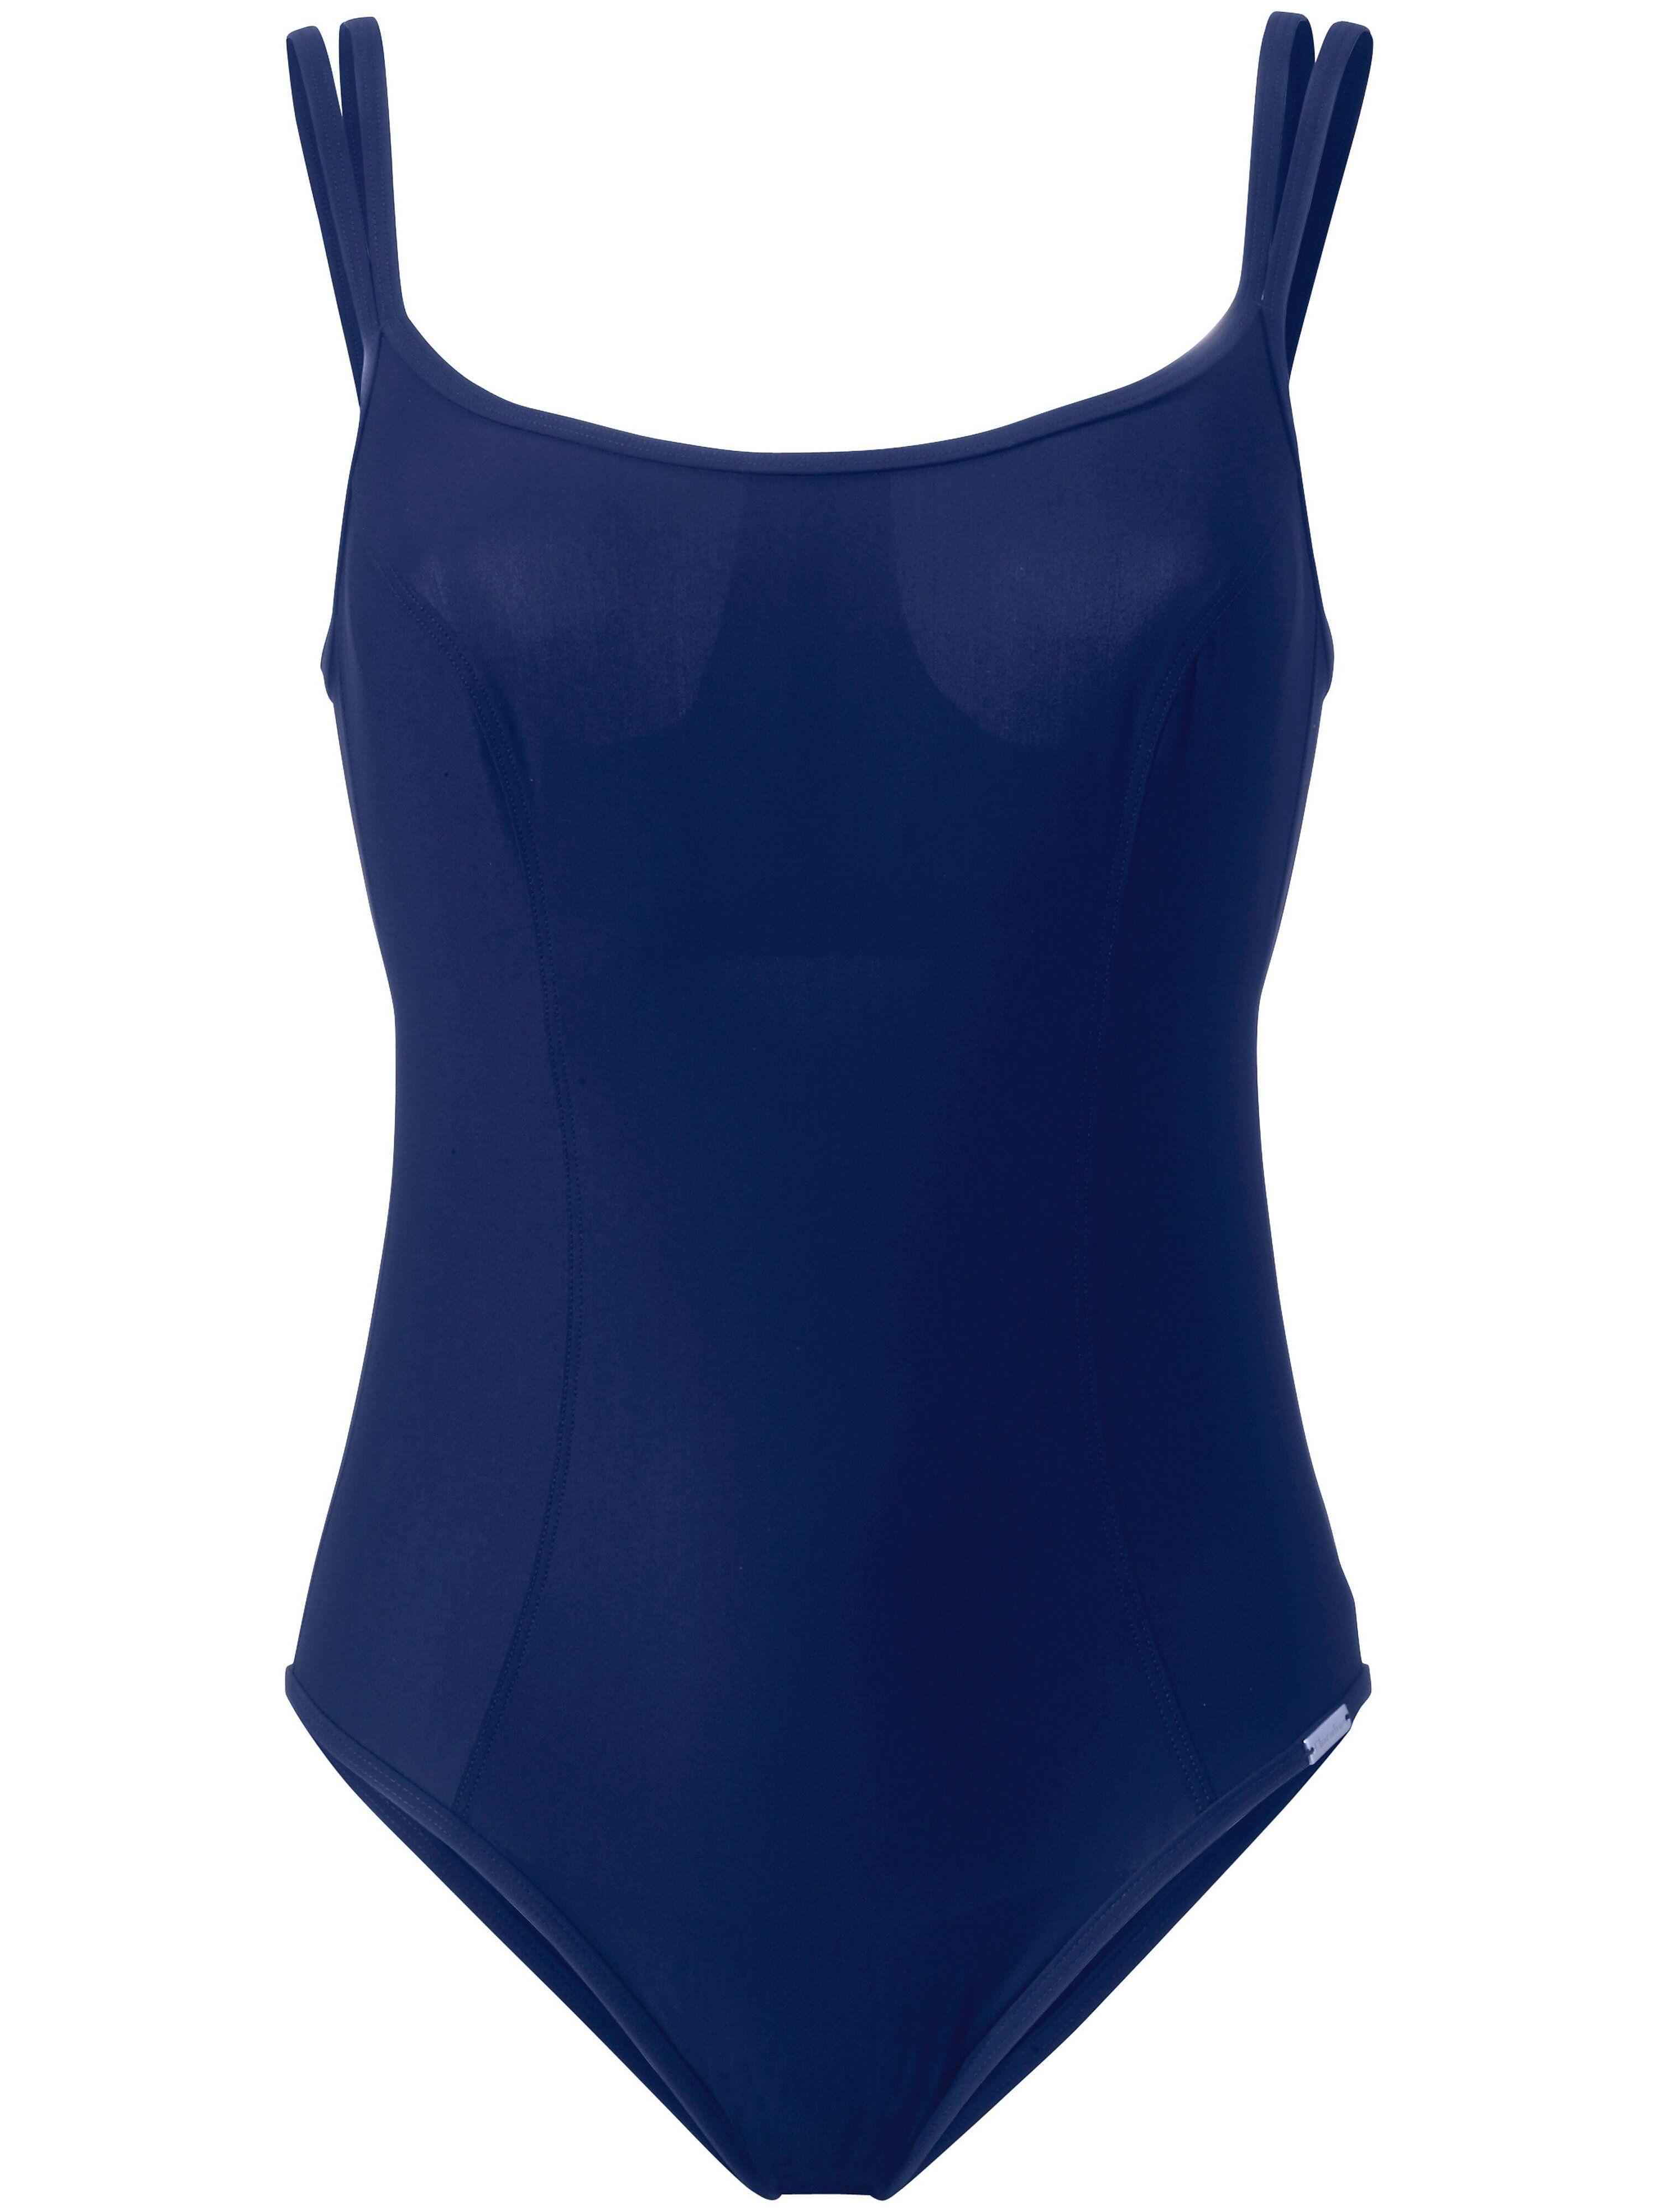 Charmline Le maillot bain  Charmline bleu  - Femme - 42